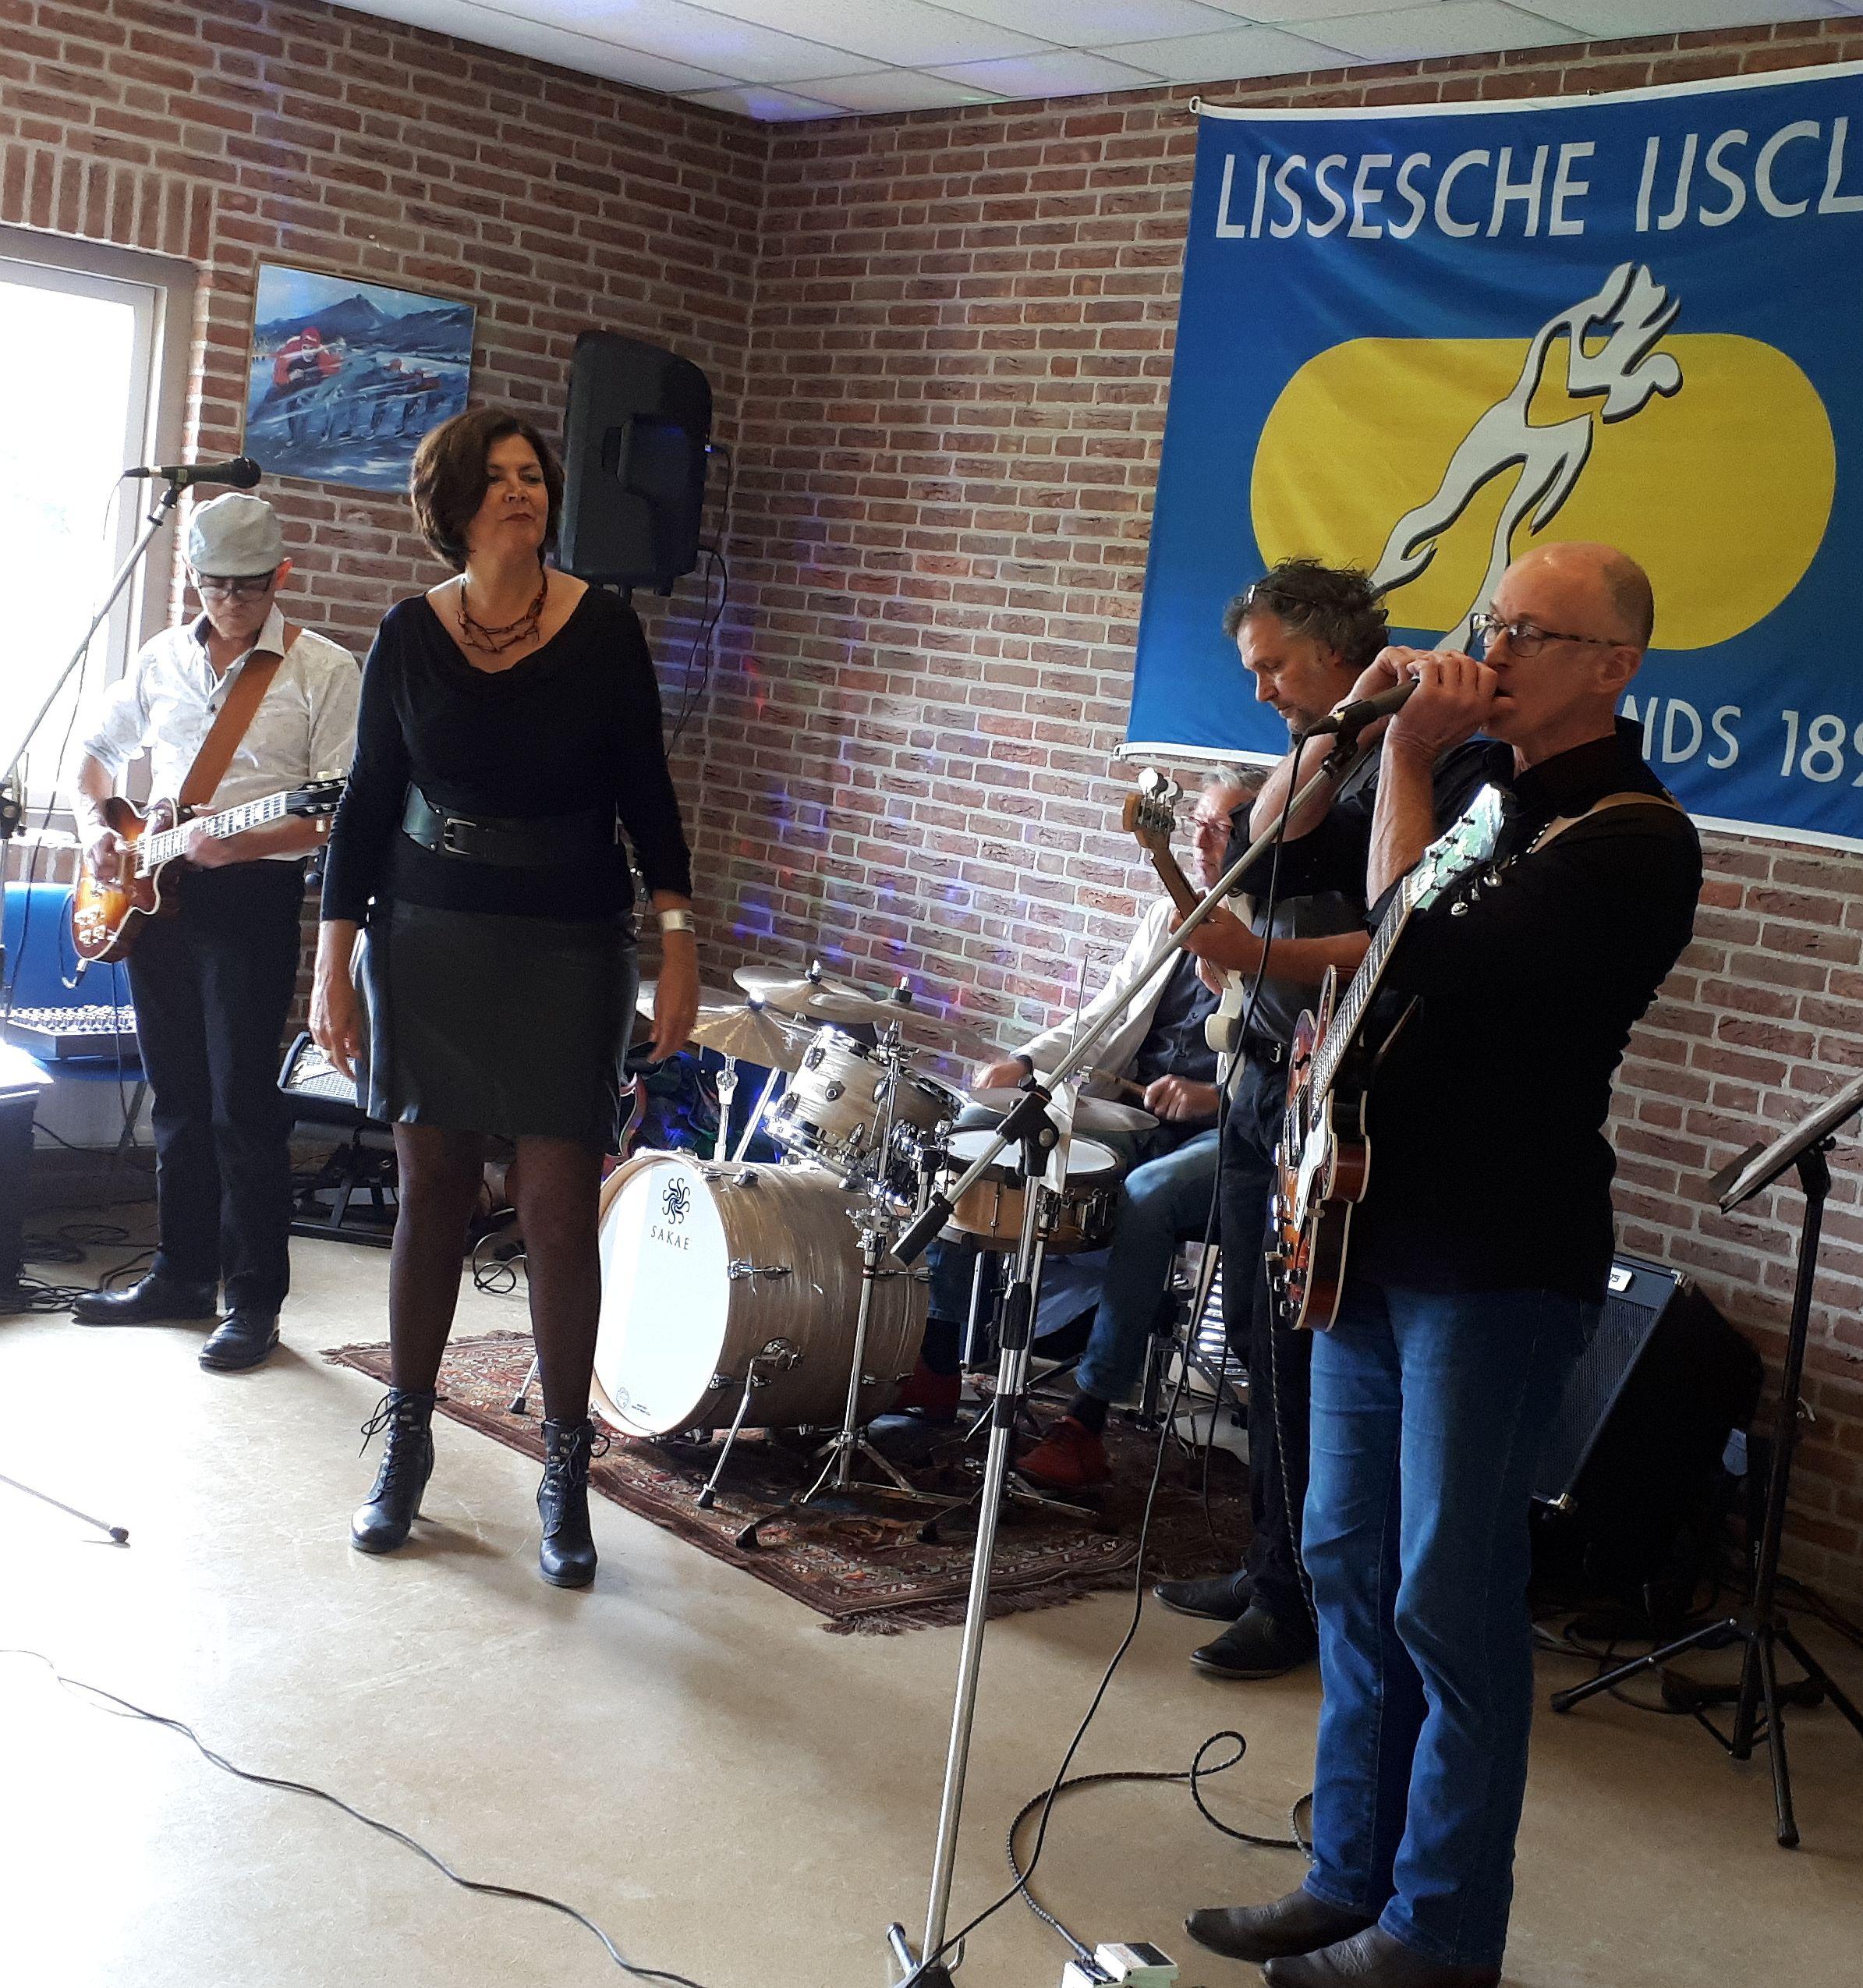 BA7 Lissesche IJsclub 2019 - diagonaal - Geke bluesharp